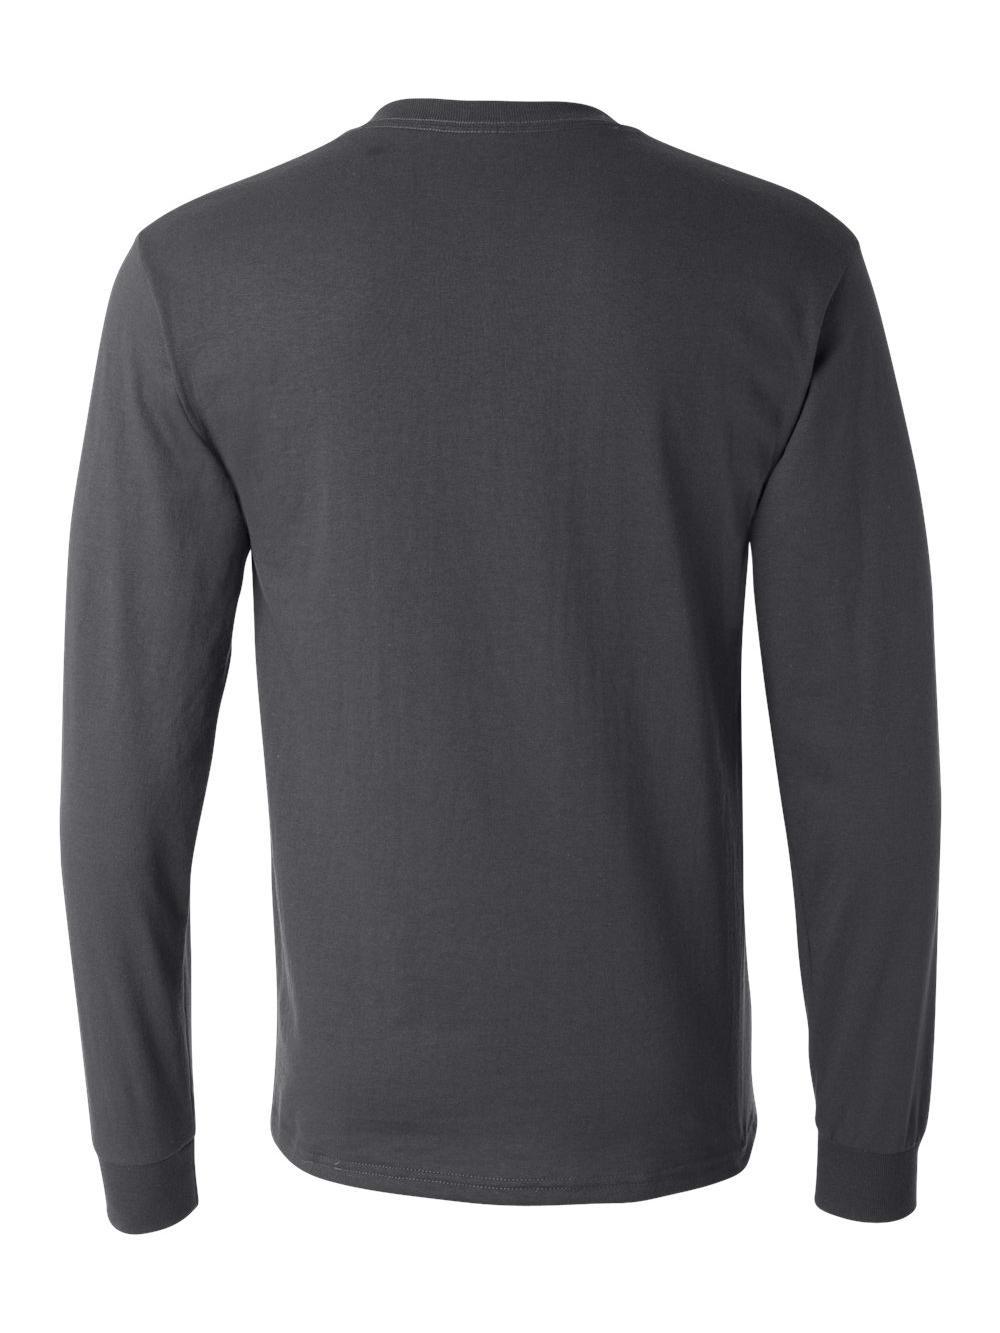 Jerzees-Dri-Power-Long-Sleeve-50-50-T-Shirt-29LSR thumbnail 25